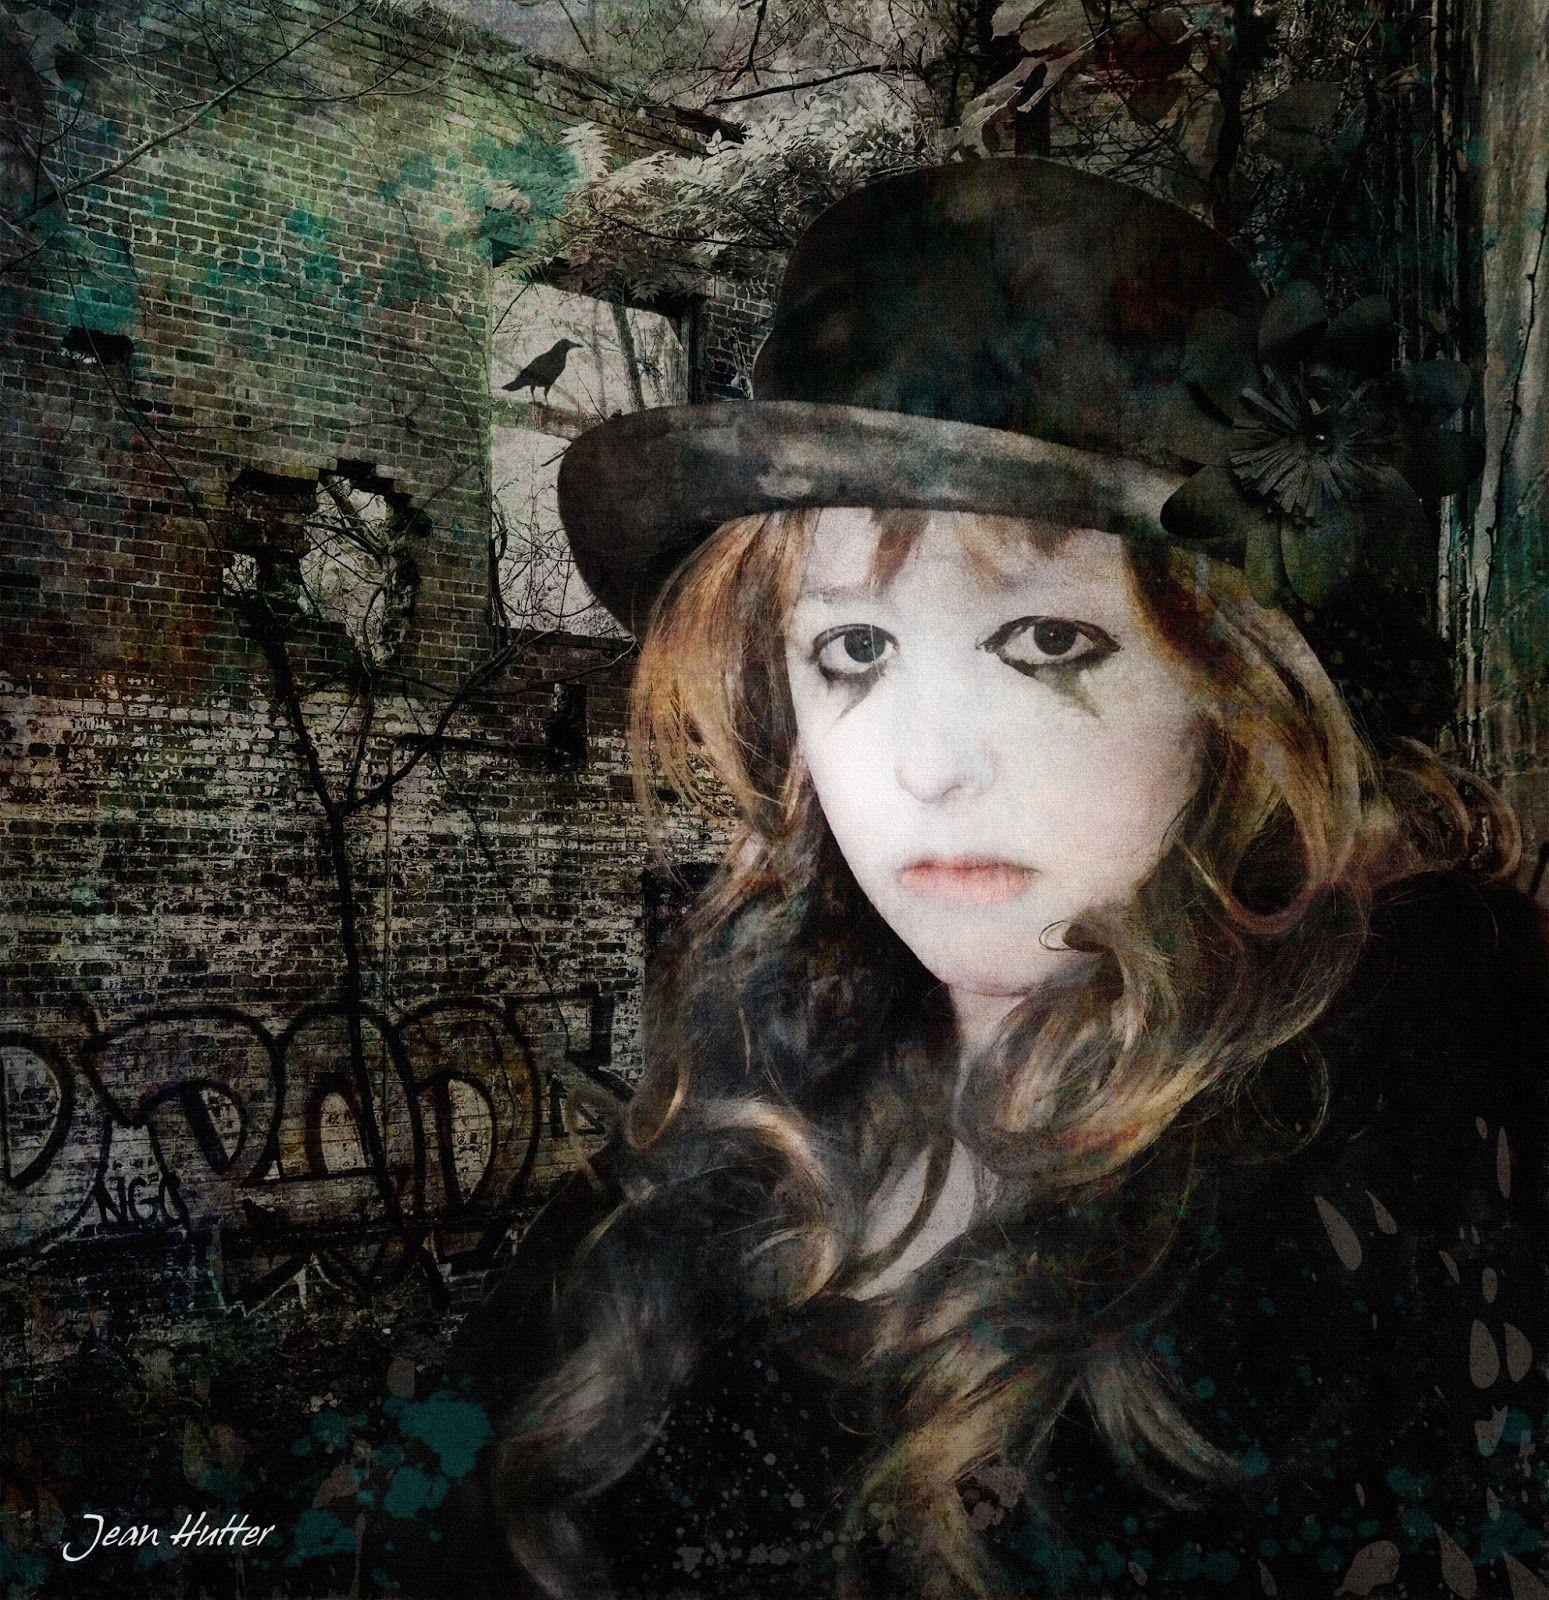 Urban Girl - Jean Hutter - Digital Views